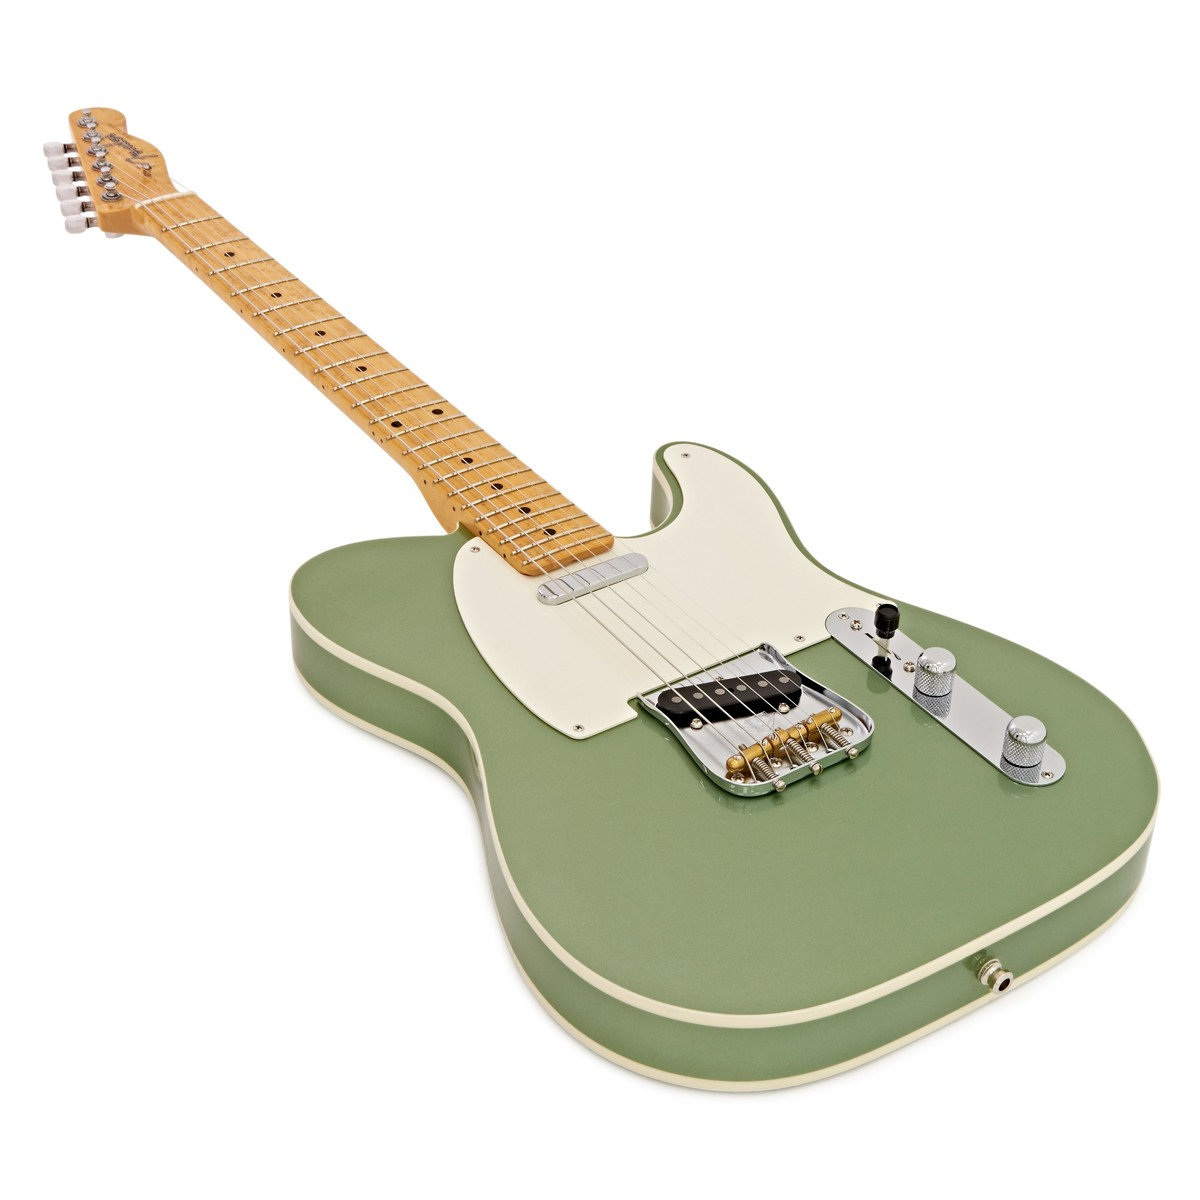 fender custom shop american custom telecaster green metallic cz529013 at. Black Bedroom Furniture Sets. Home Design Ideas